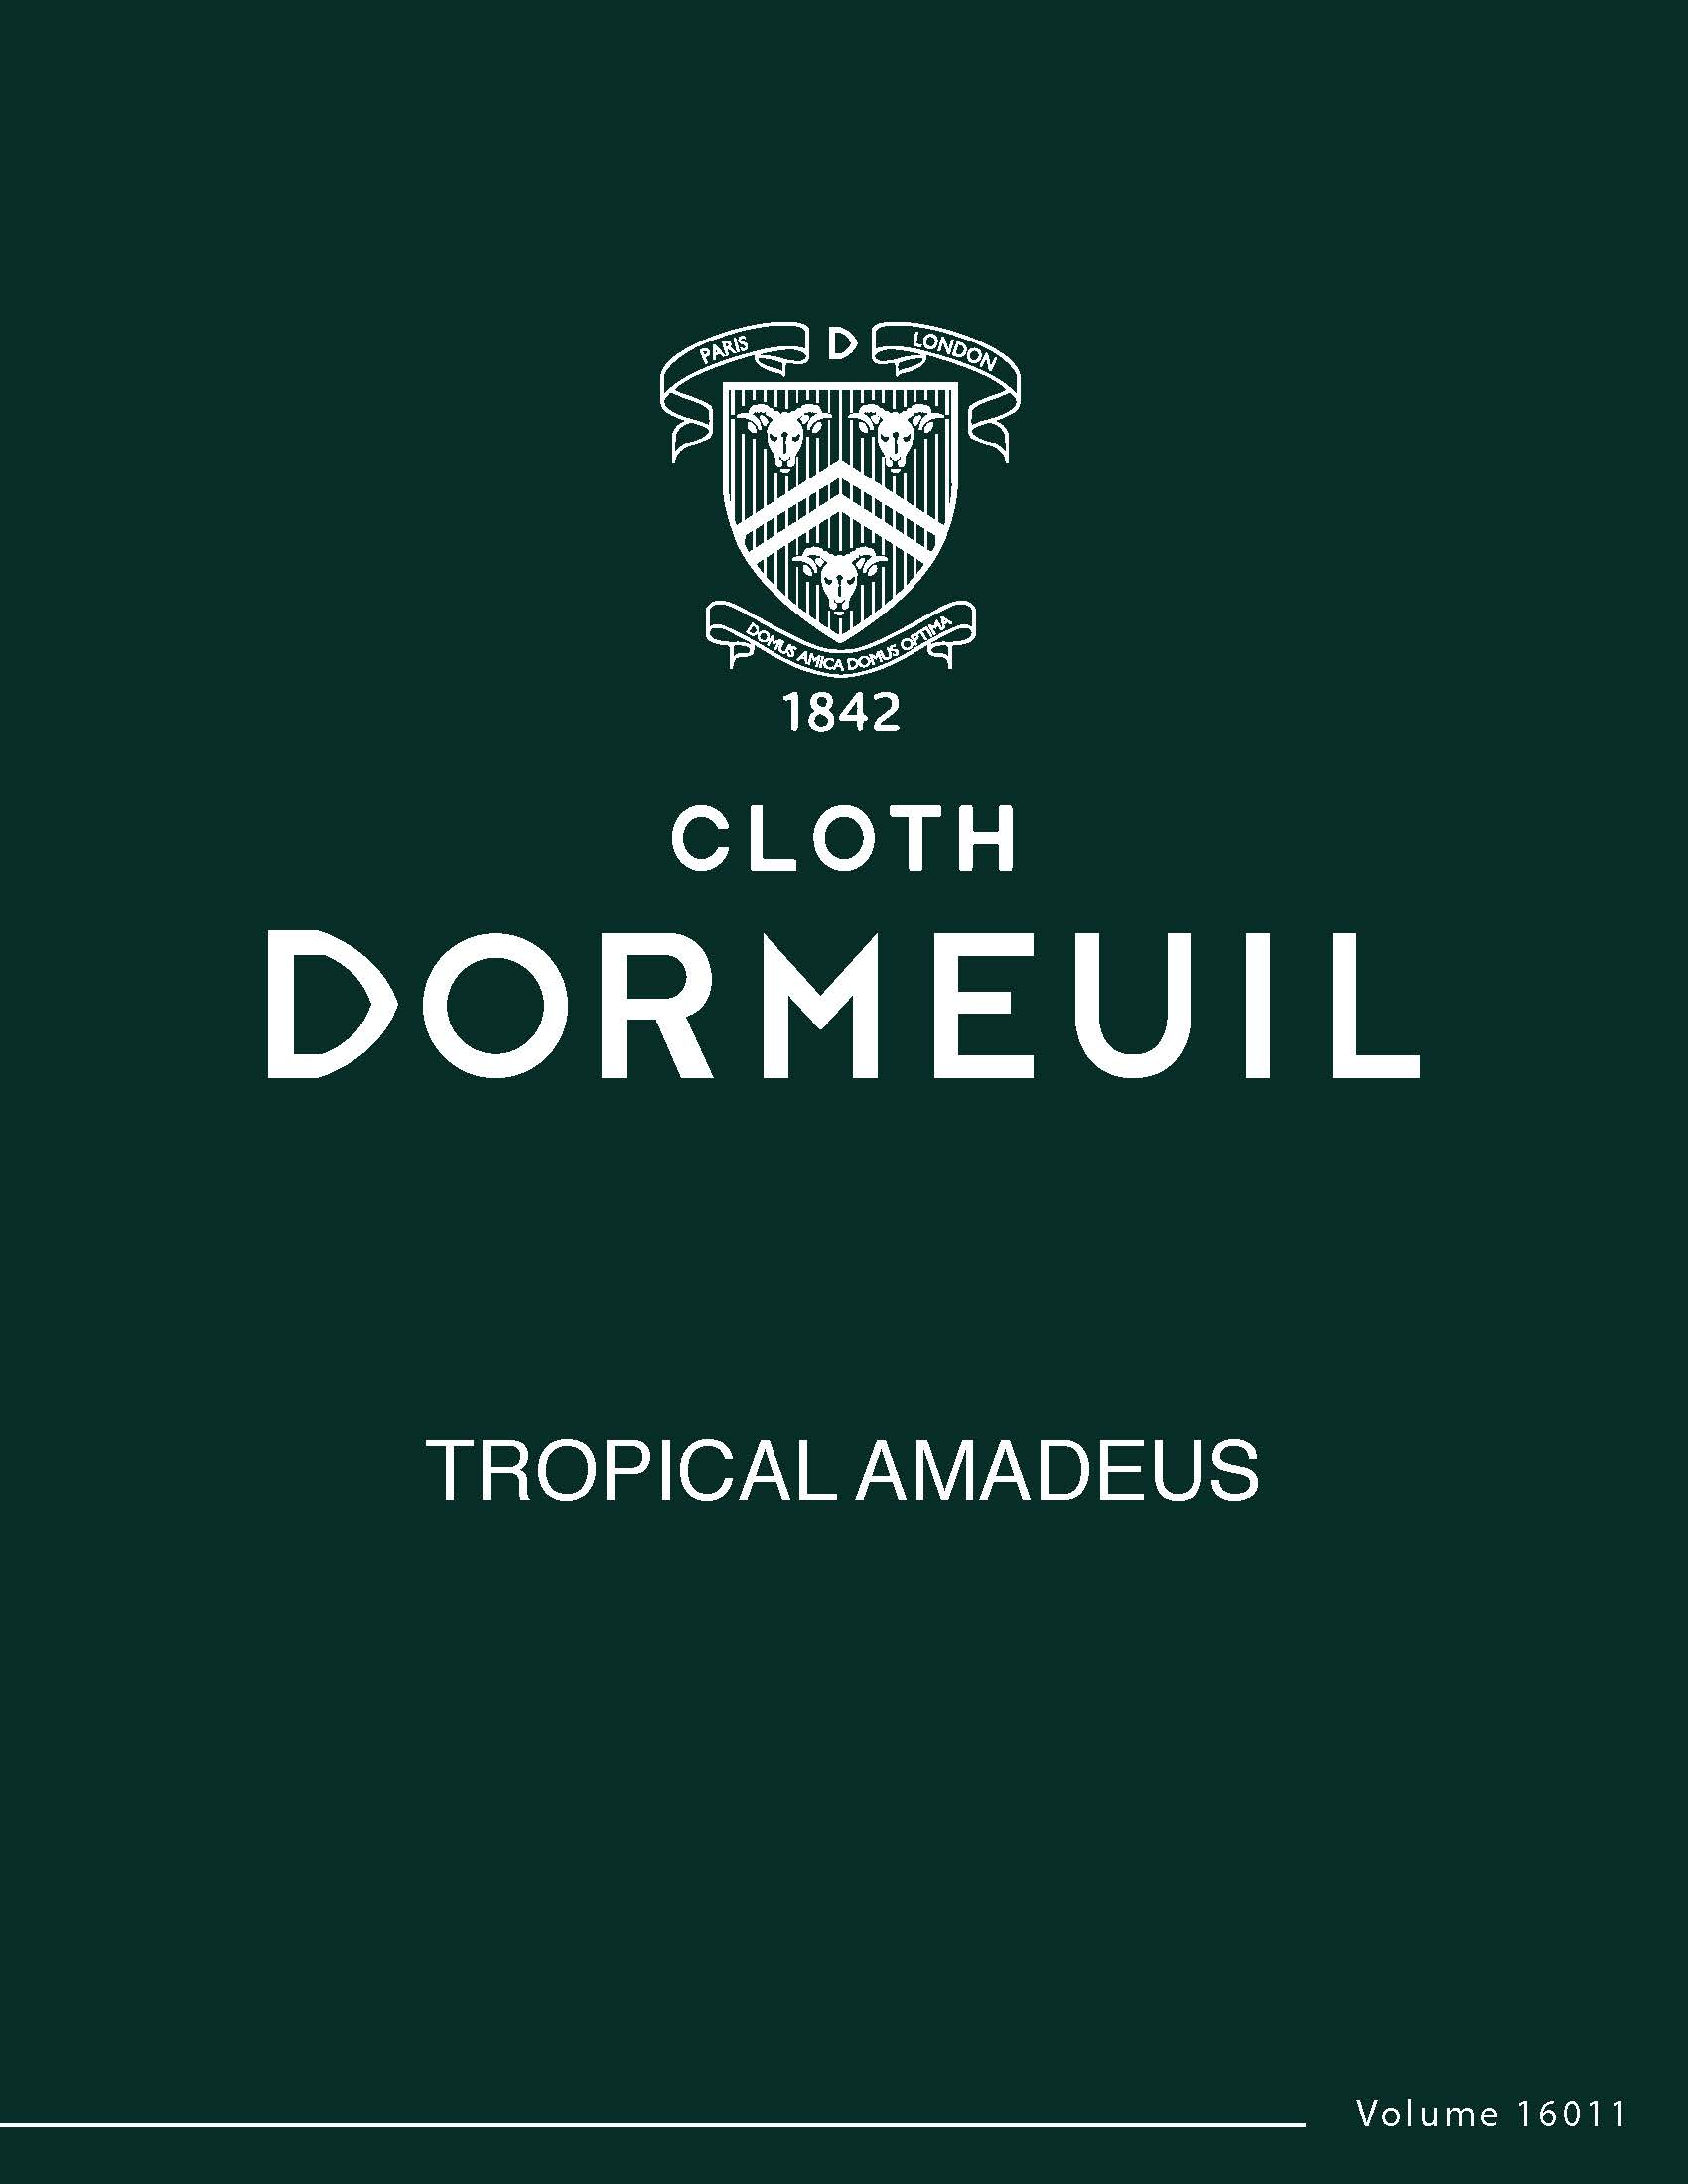 Dormeuil_Tropical_Amadeus_V16011.jpg